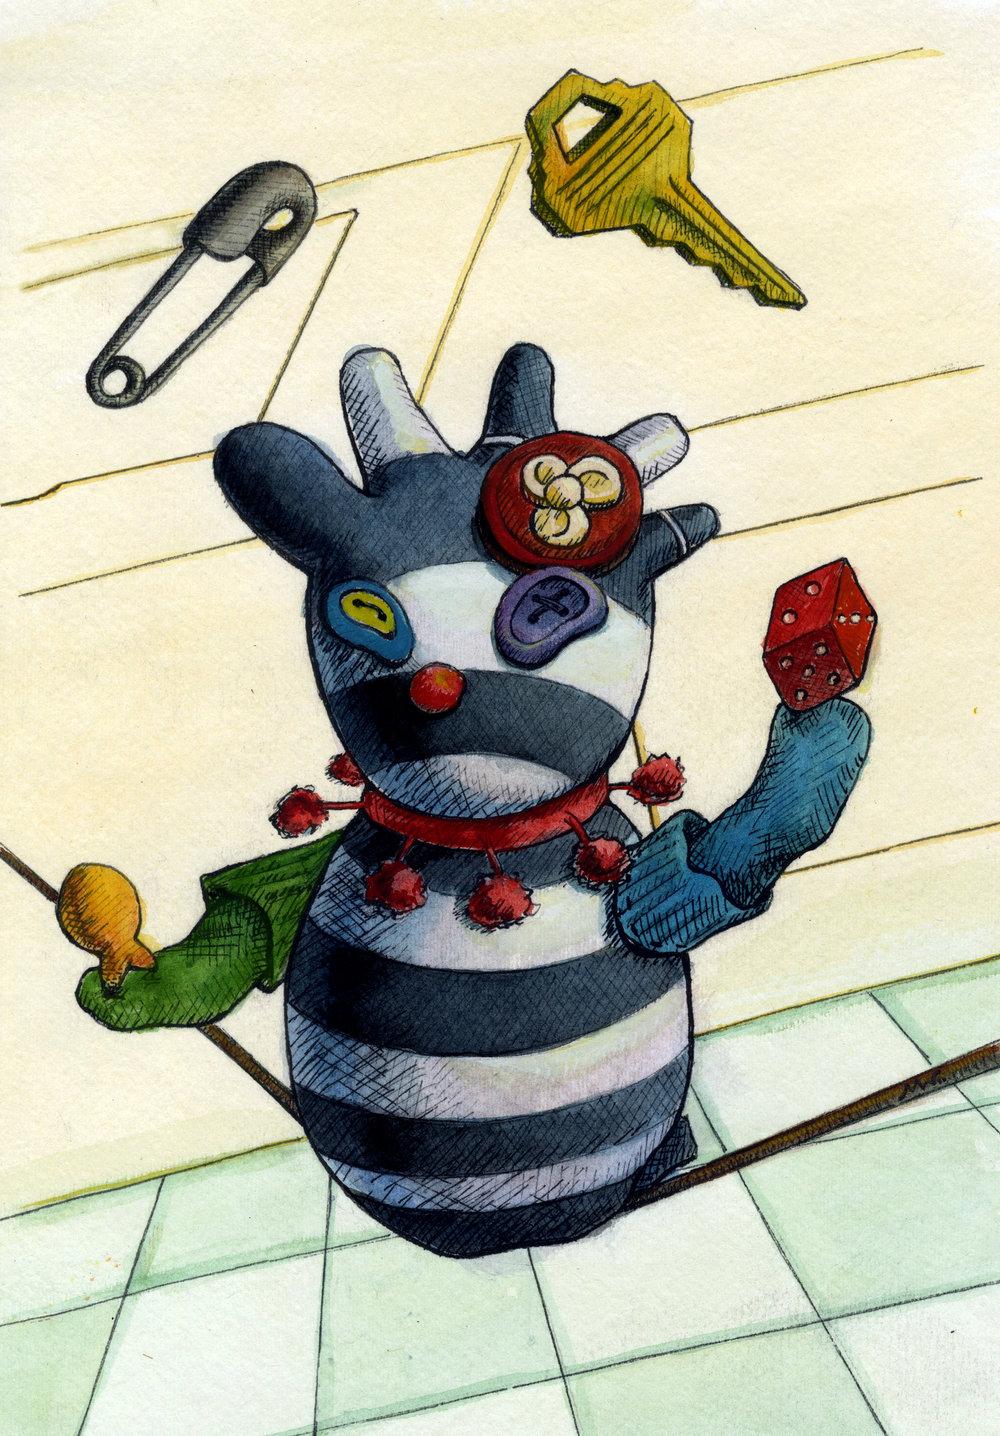 jester painting edited.jpg